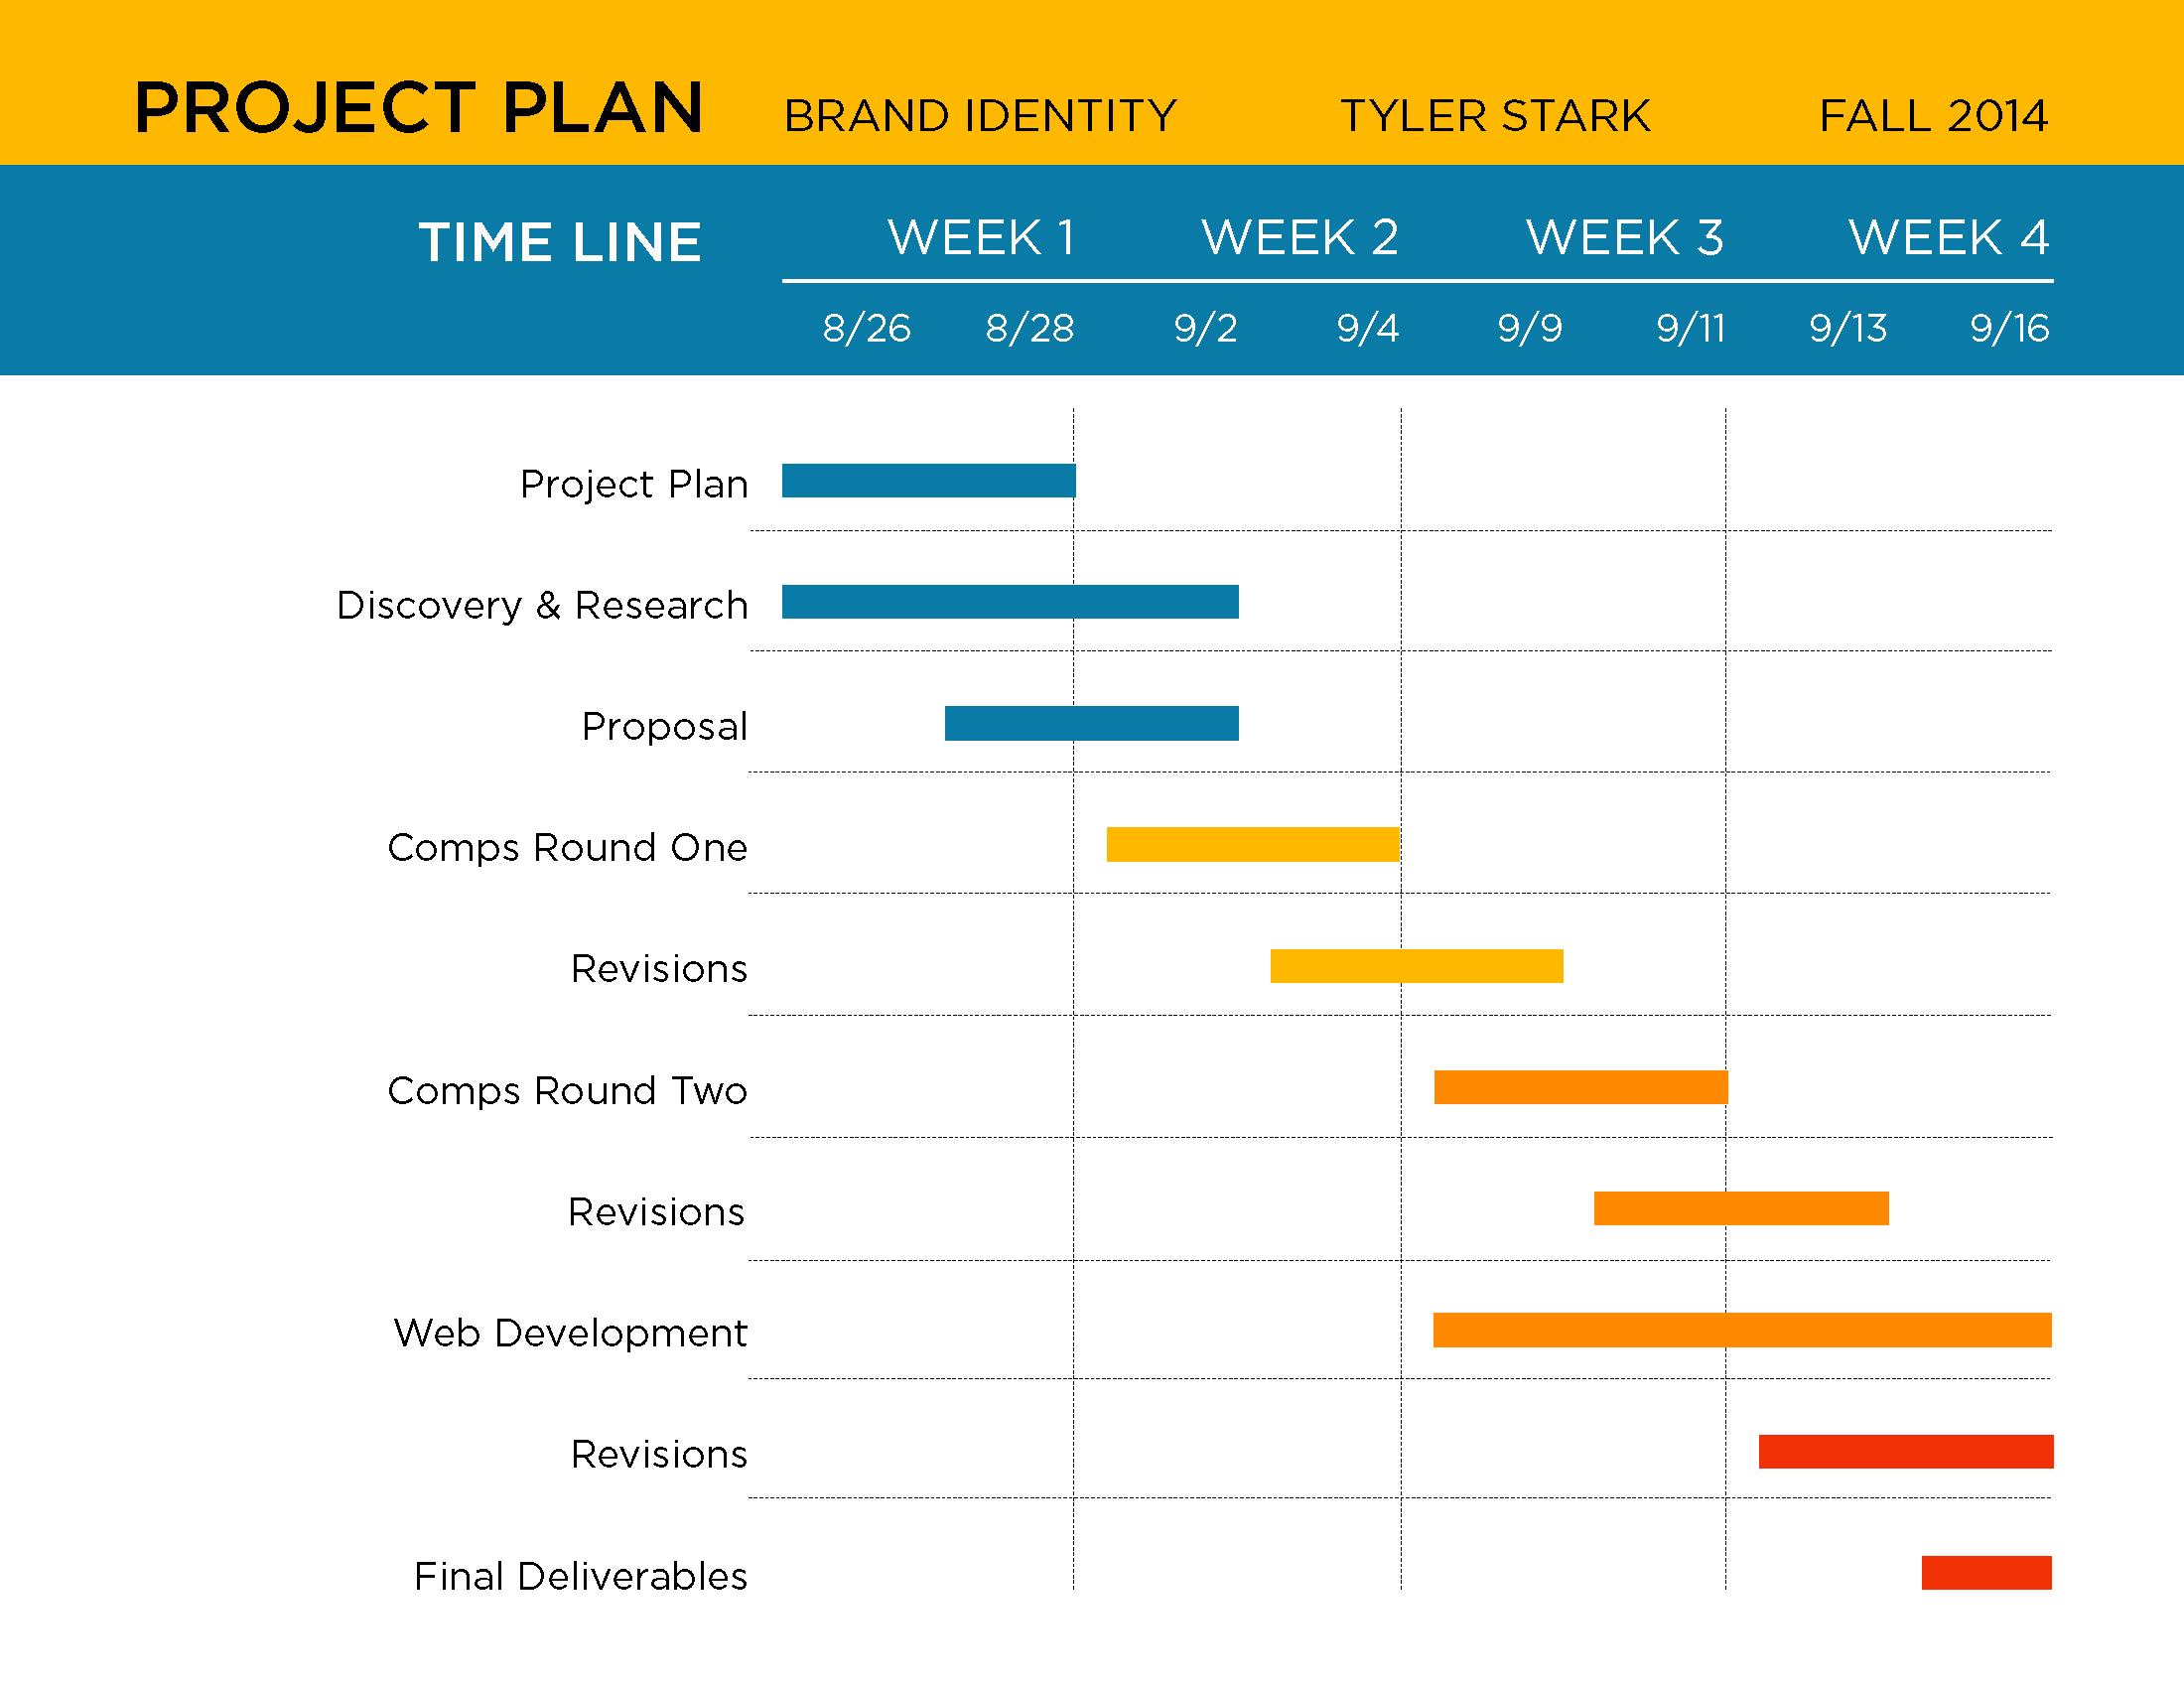 project timeline design - Khafre